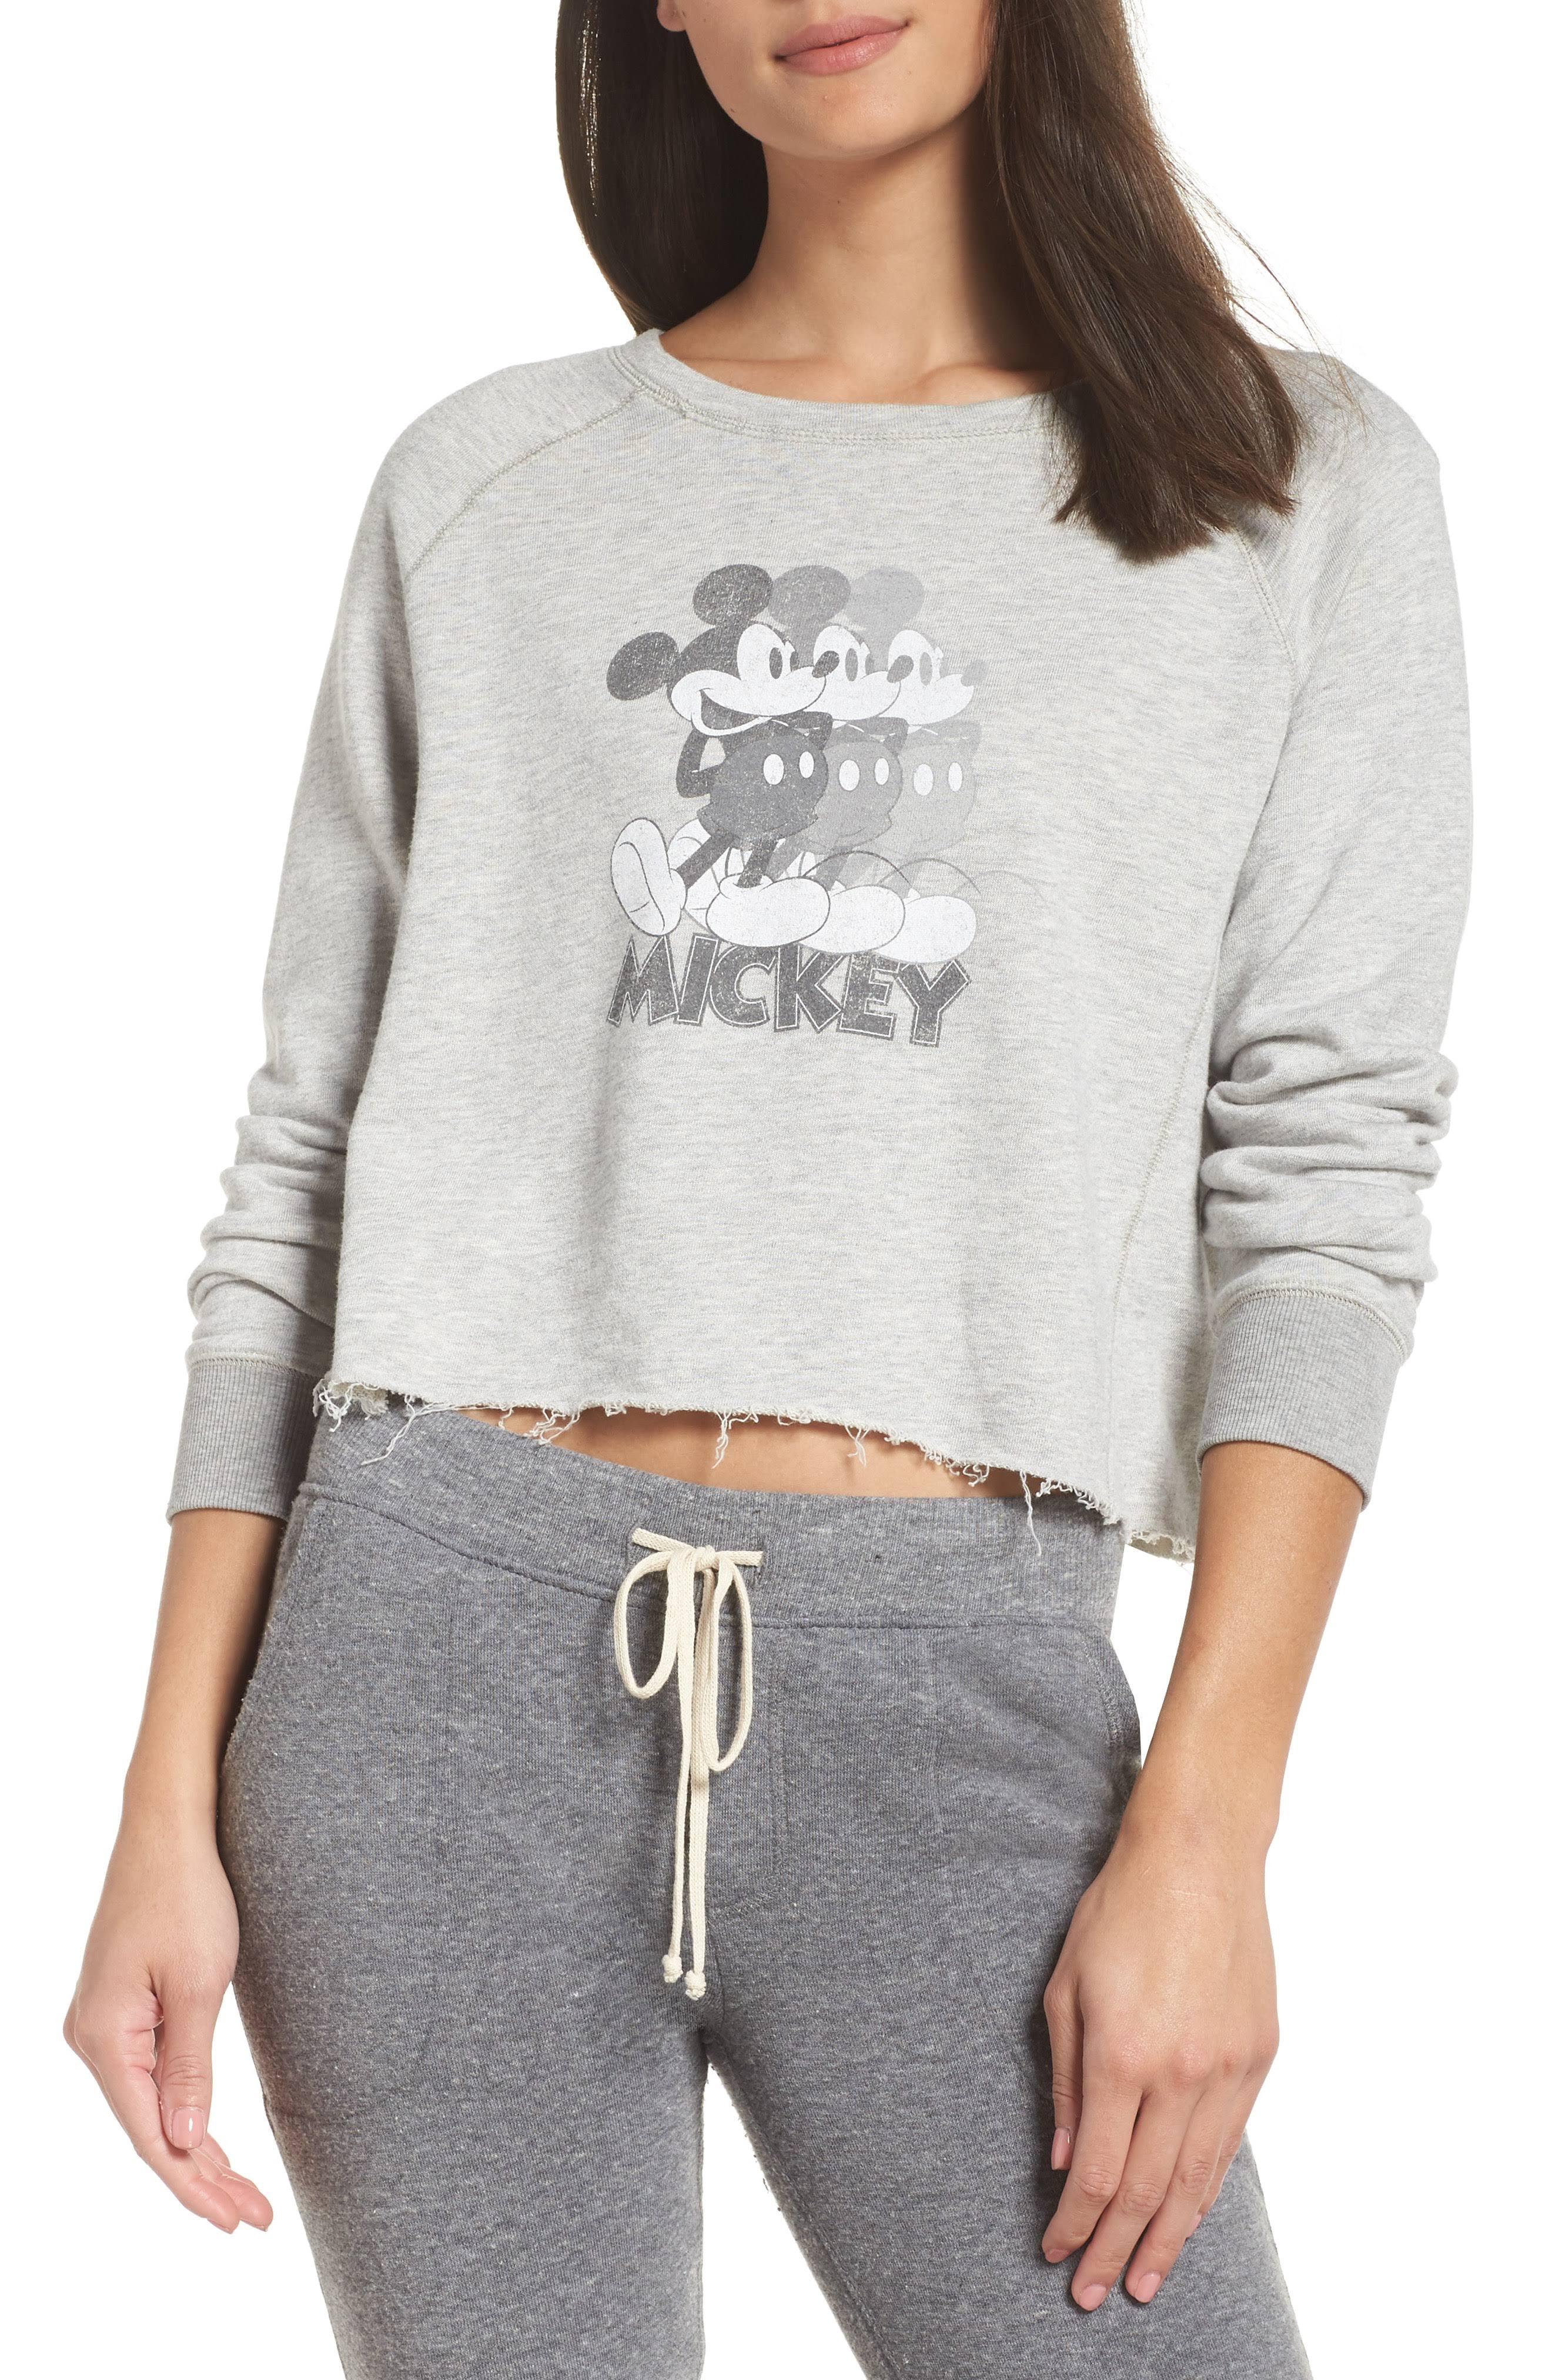 Grau Wiederholung Pullover Lerner Größe Damen Medium In Mouse David Mickey wxgCcPfpq